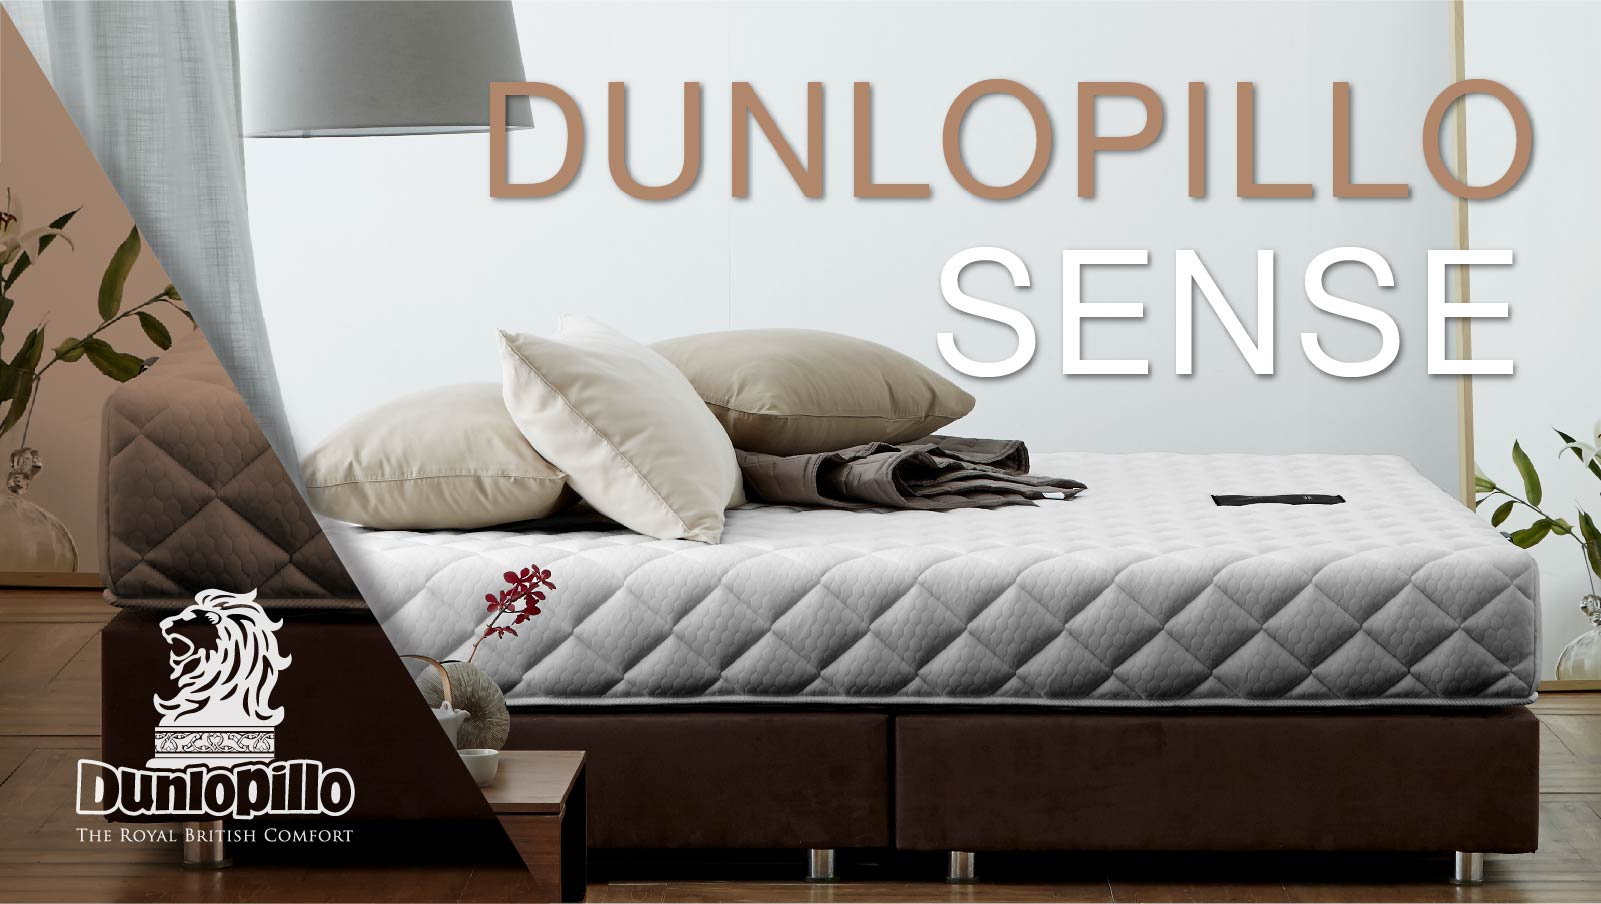 Dunlopillo Mattress- Sense